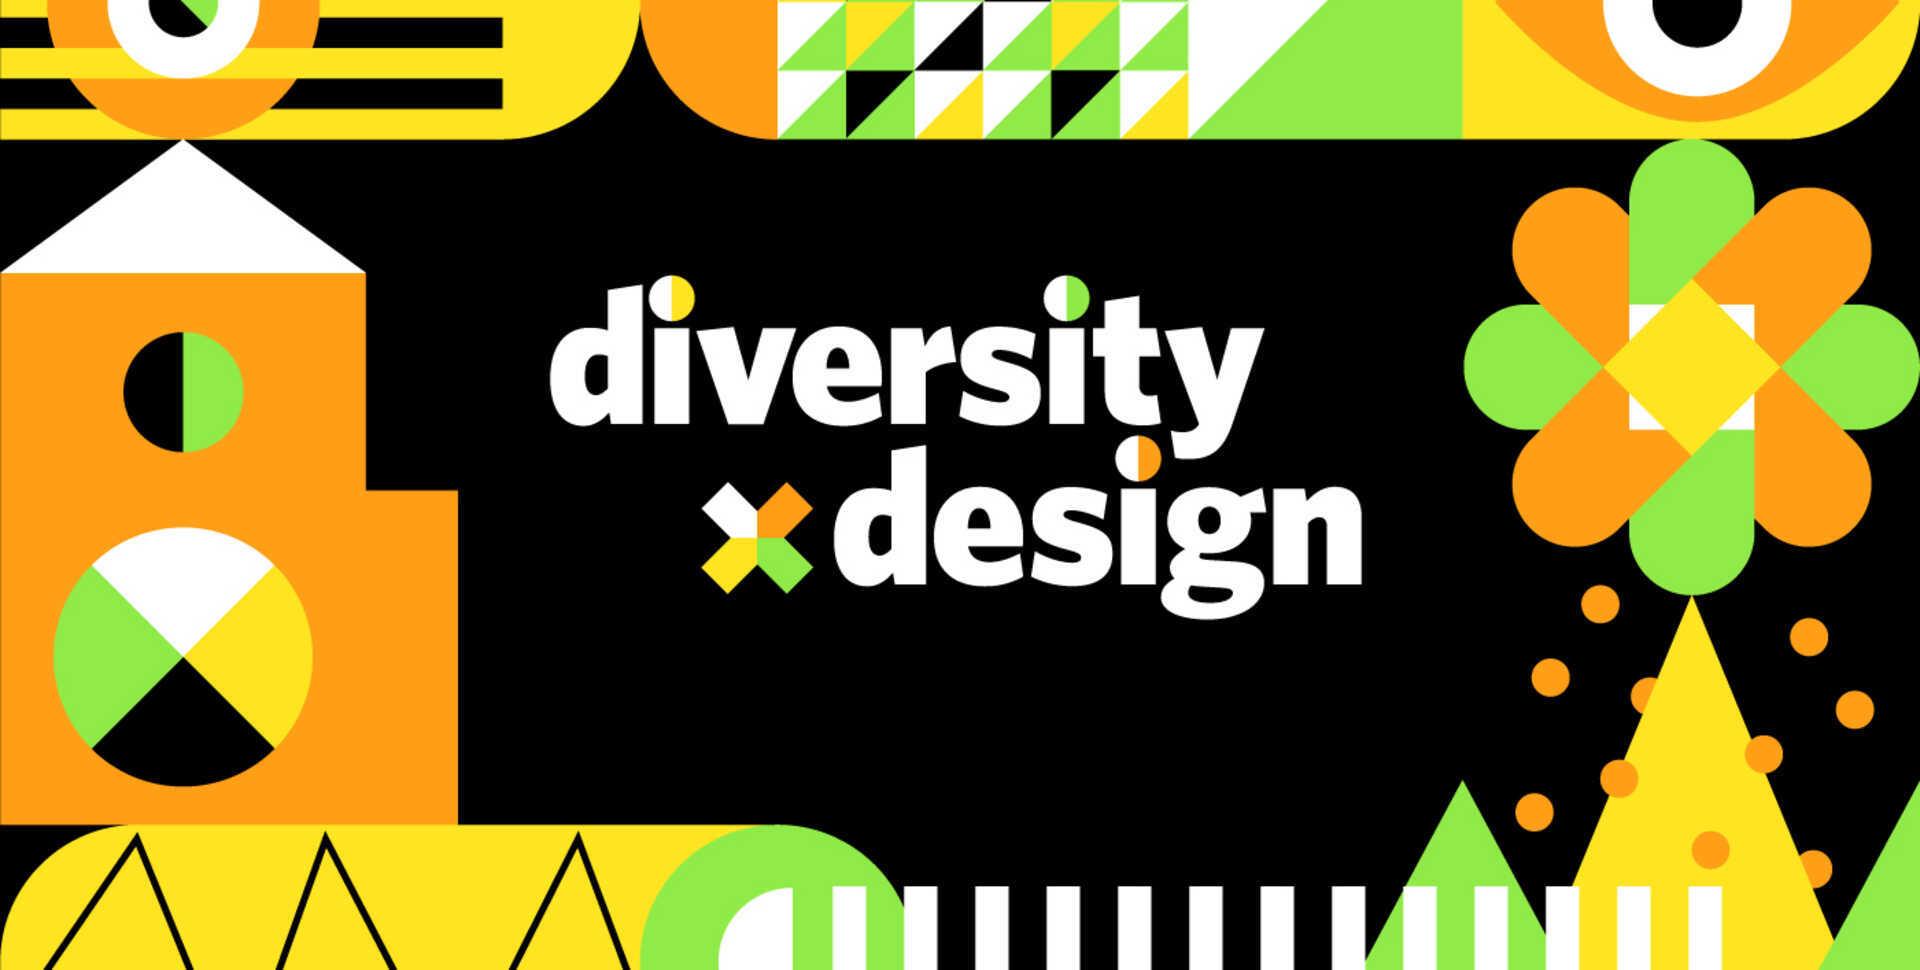 Diversity x design a student poster contest